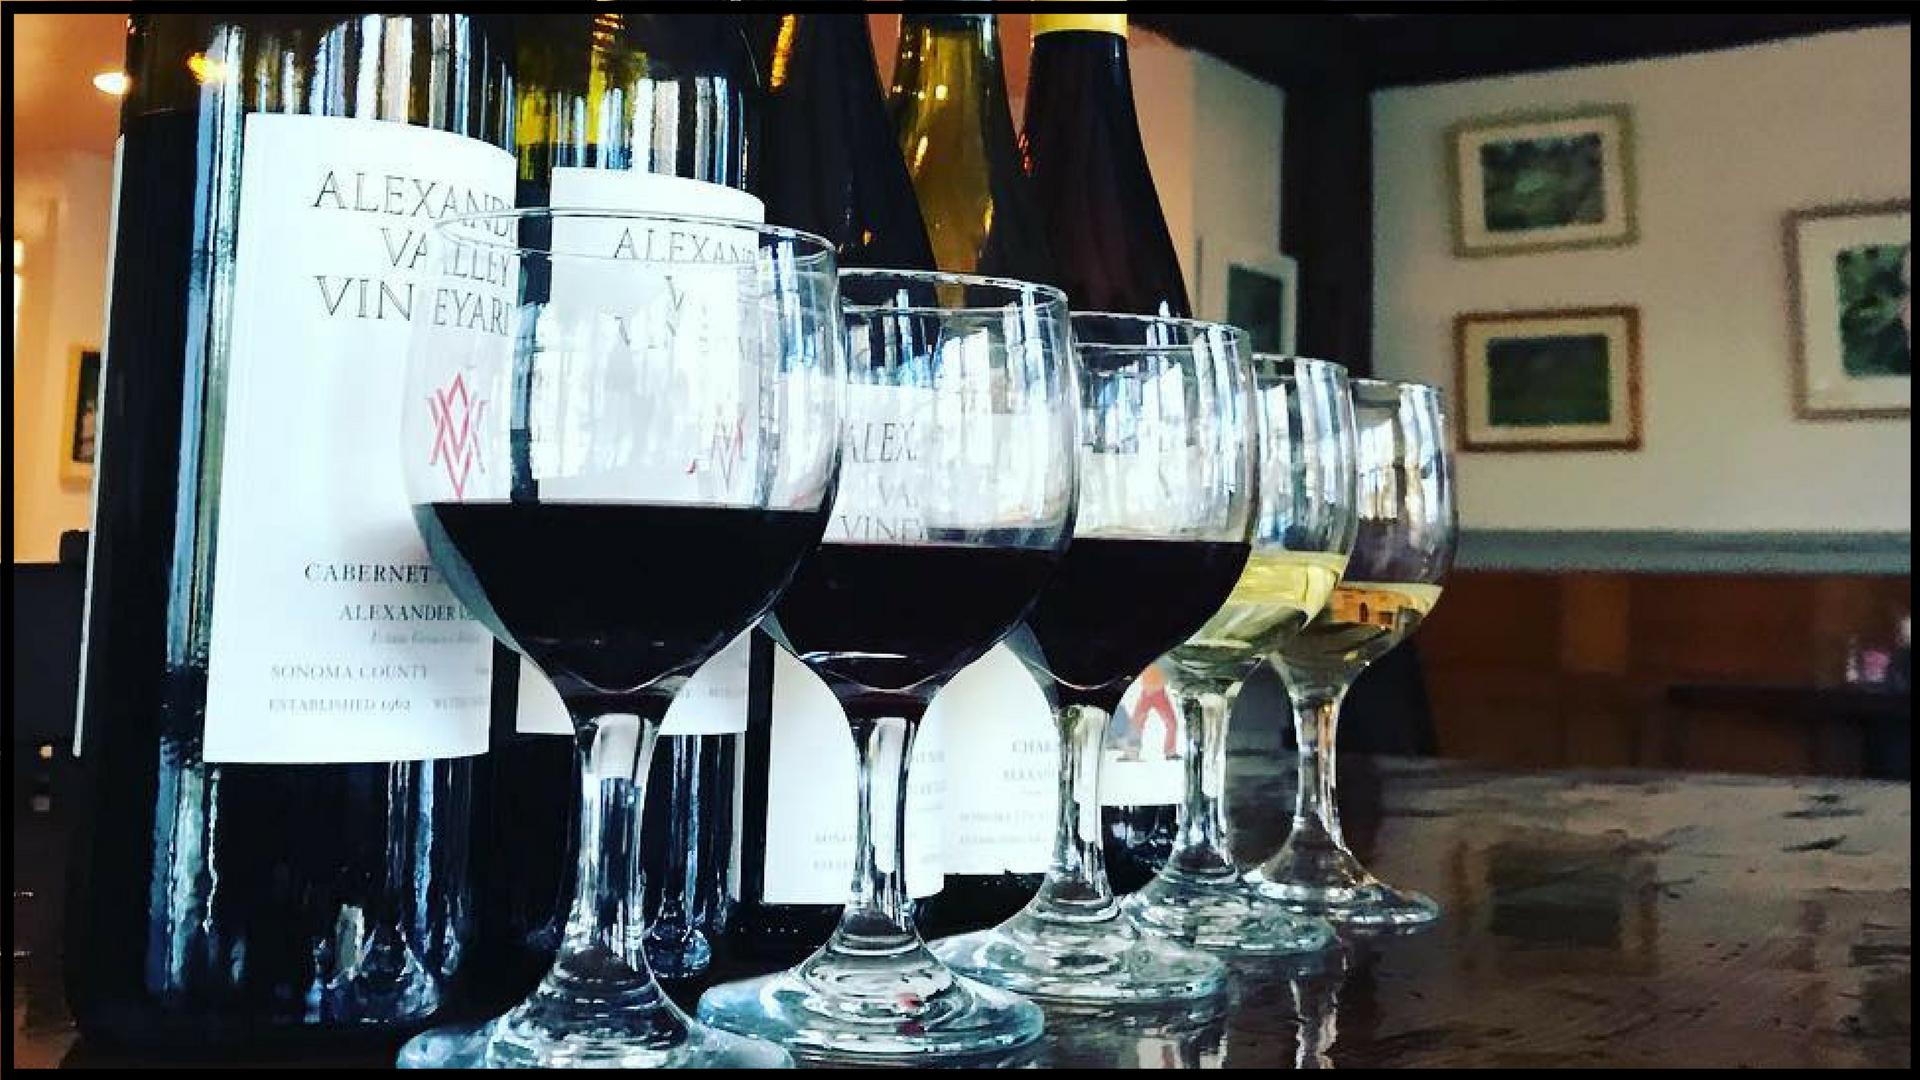 Alexander Valley Vineyards Wine Dinner at The Latham House Tavern